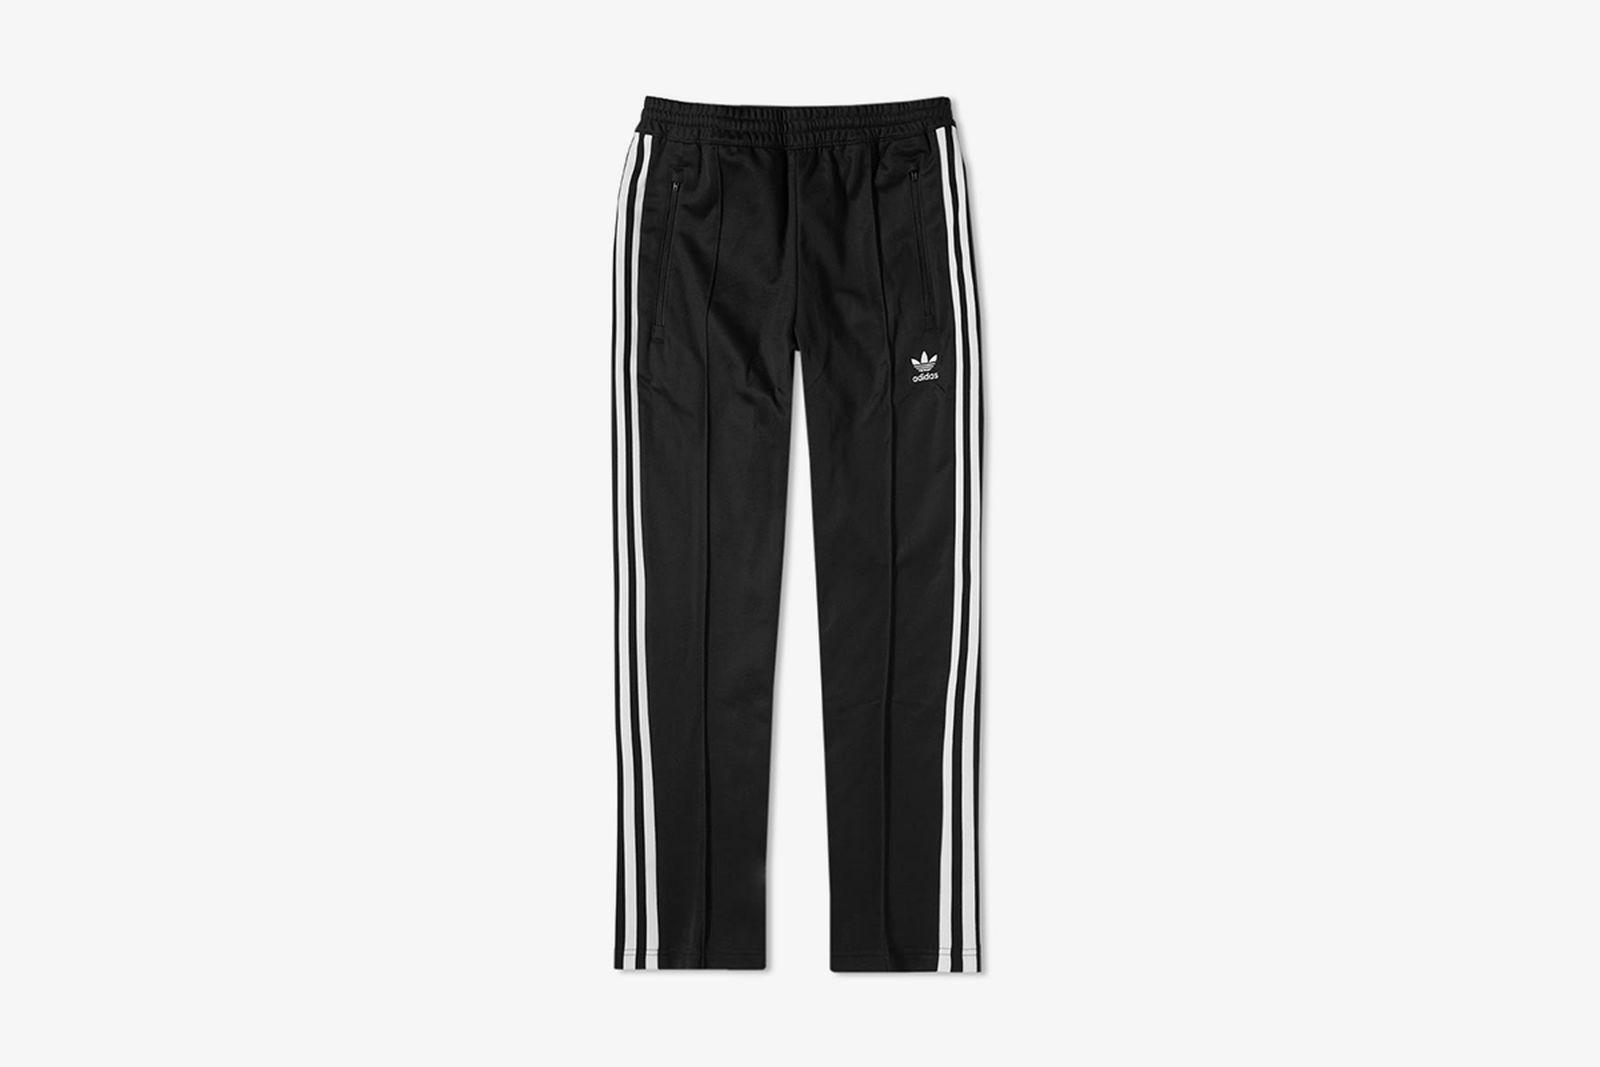 19 07 2018 adidas beckenbauertrackpant black cw1269 mo 1 Margiela Stüssy end